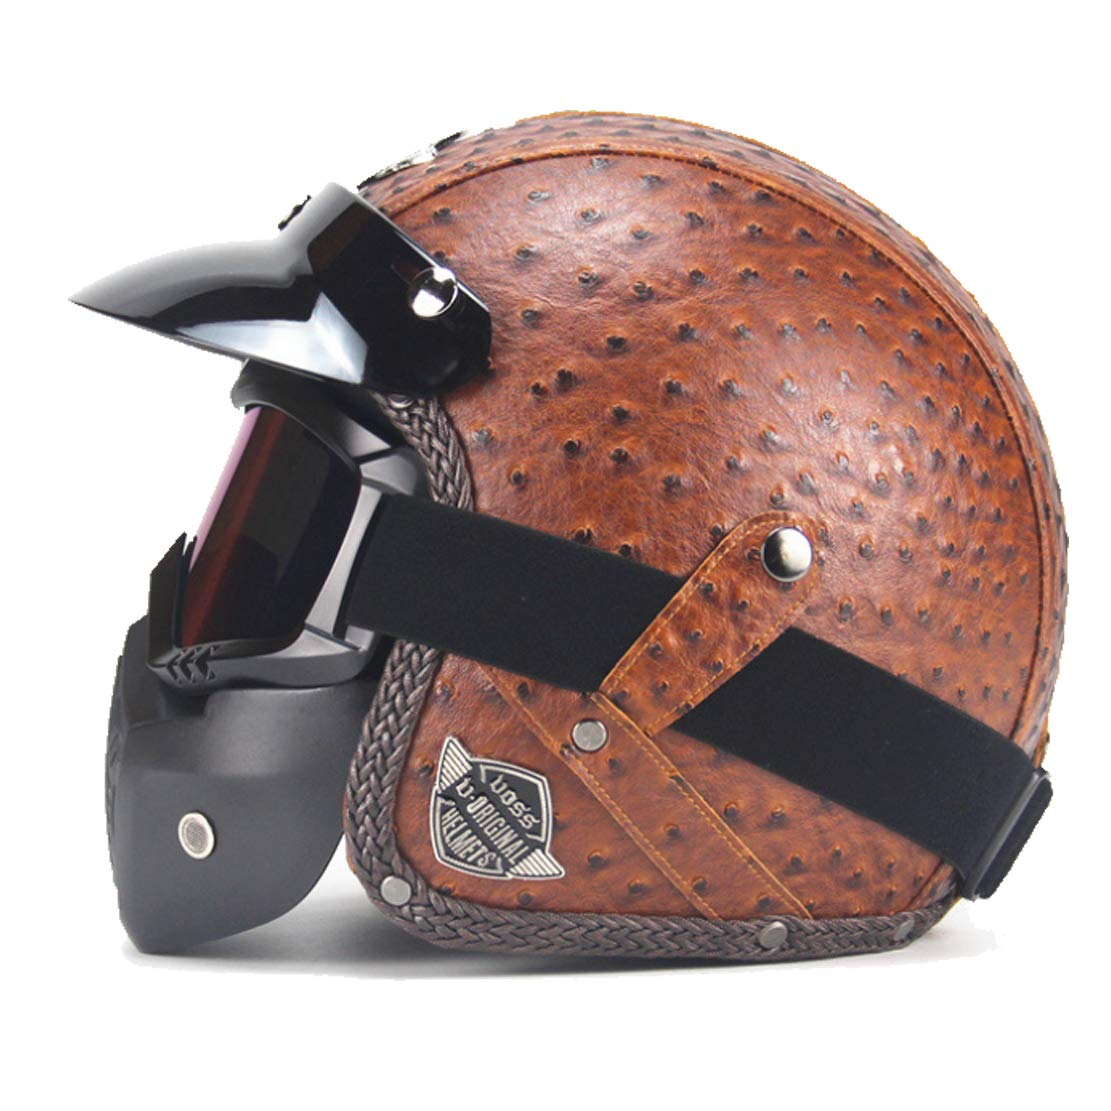 Vintage casco hand-made retro Harley casco 3/4 del casco mezzo del casco per moto Harley Yamaha Honda moto/elettrico honor JD harley honda